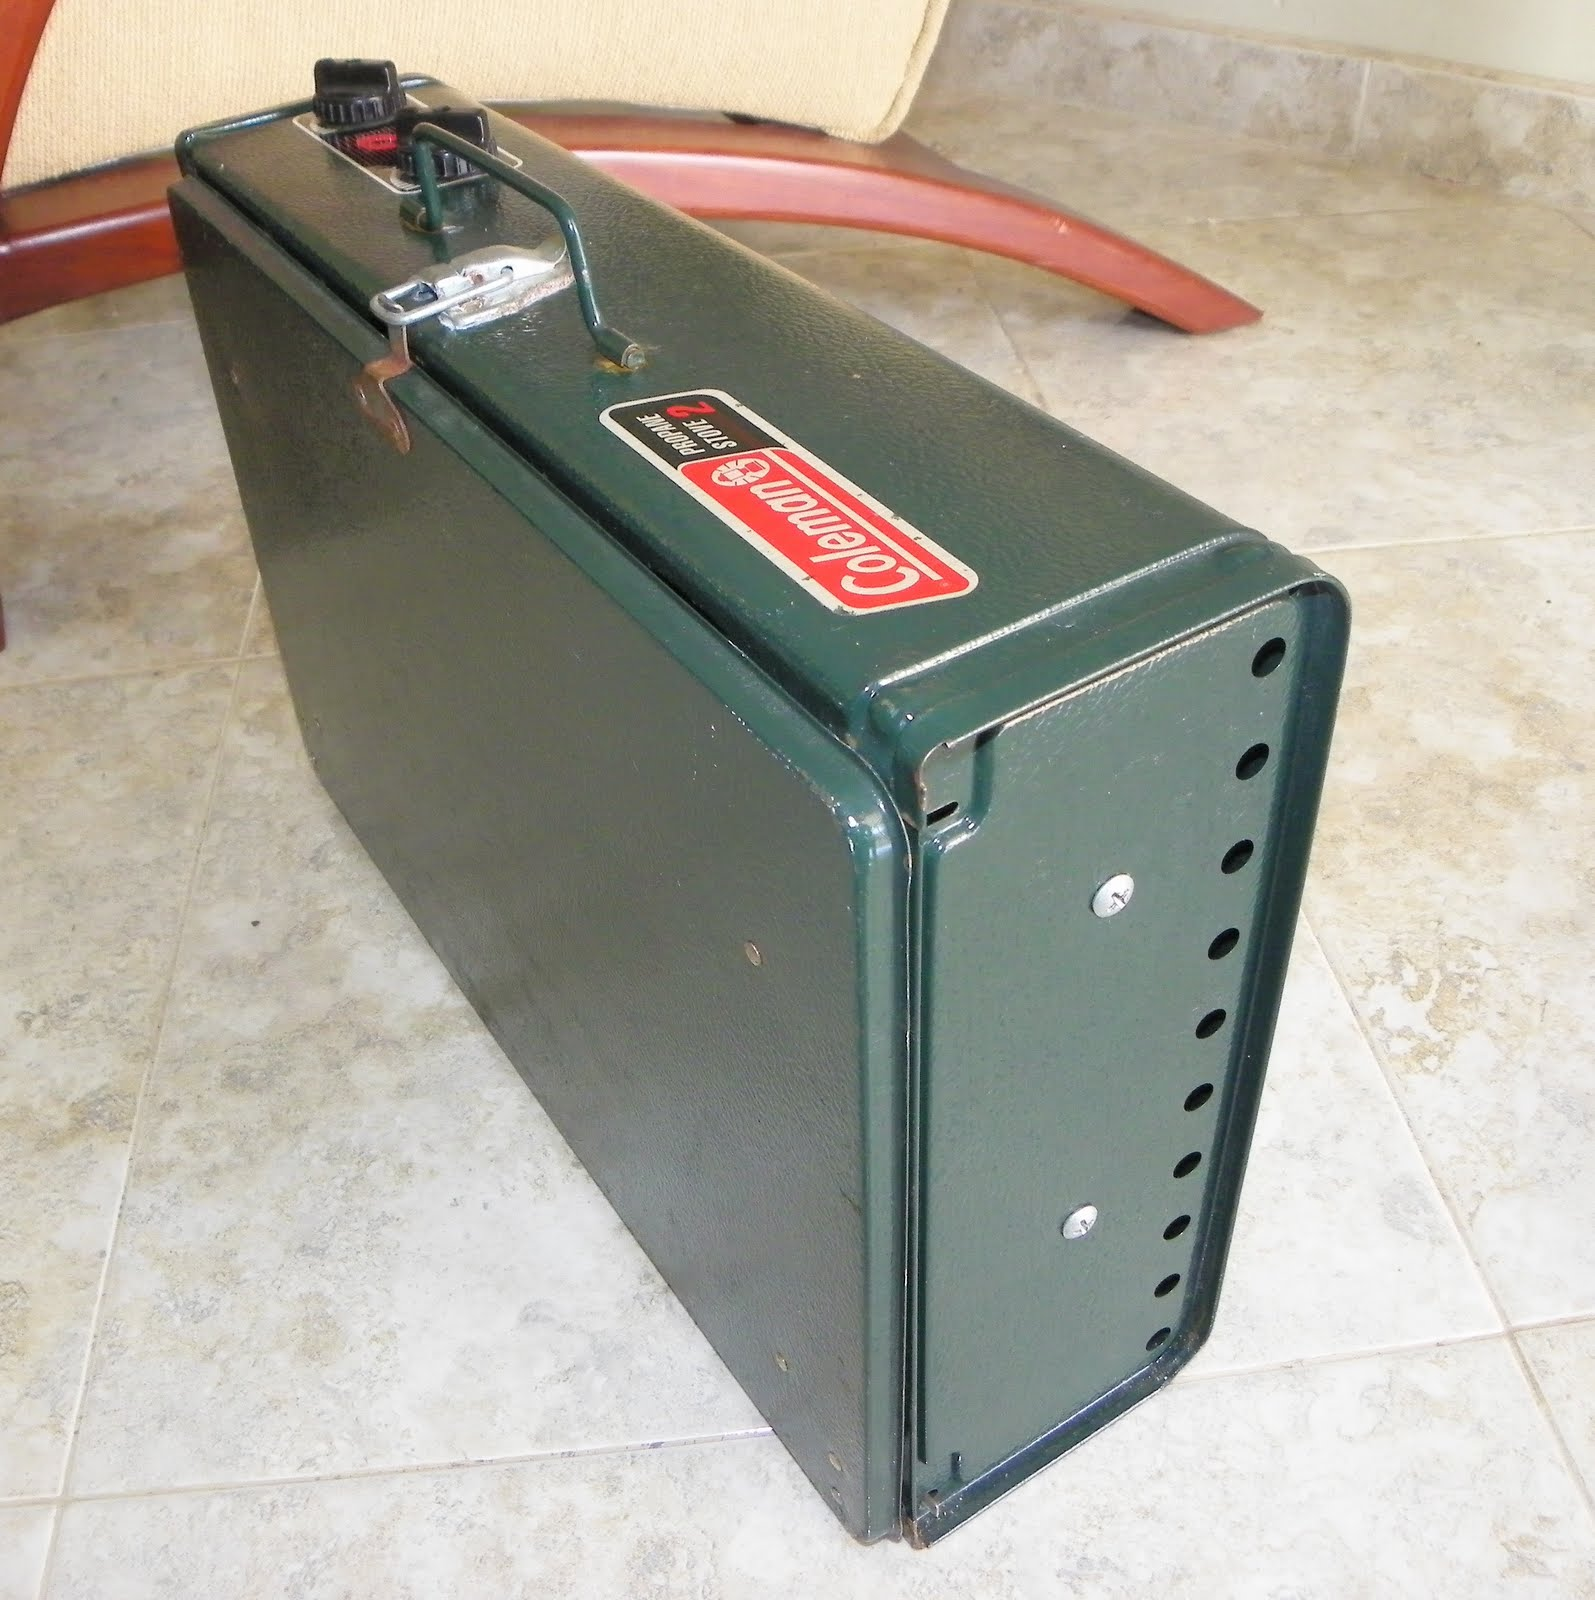 Venta de garaje electr nica cocina portatil coleman for Cocina de gas portatil